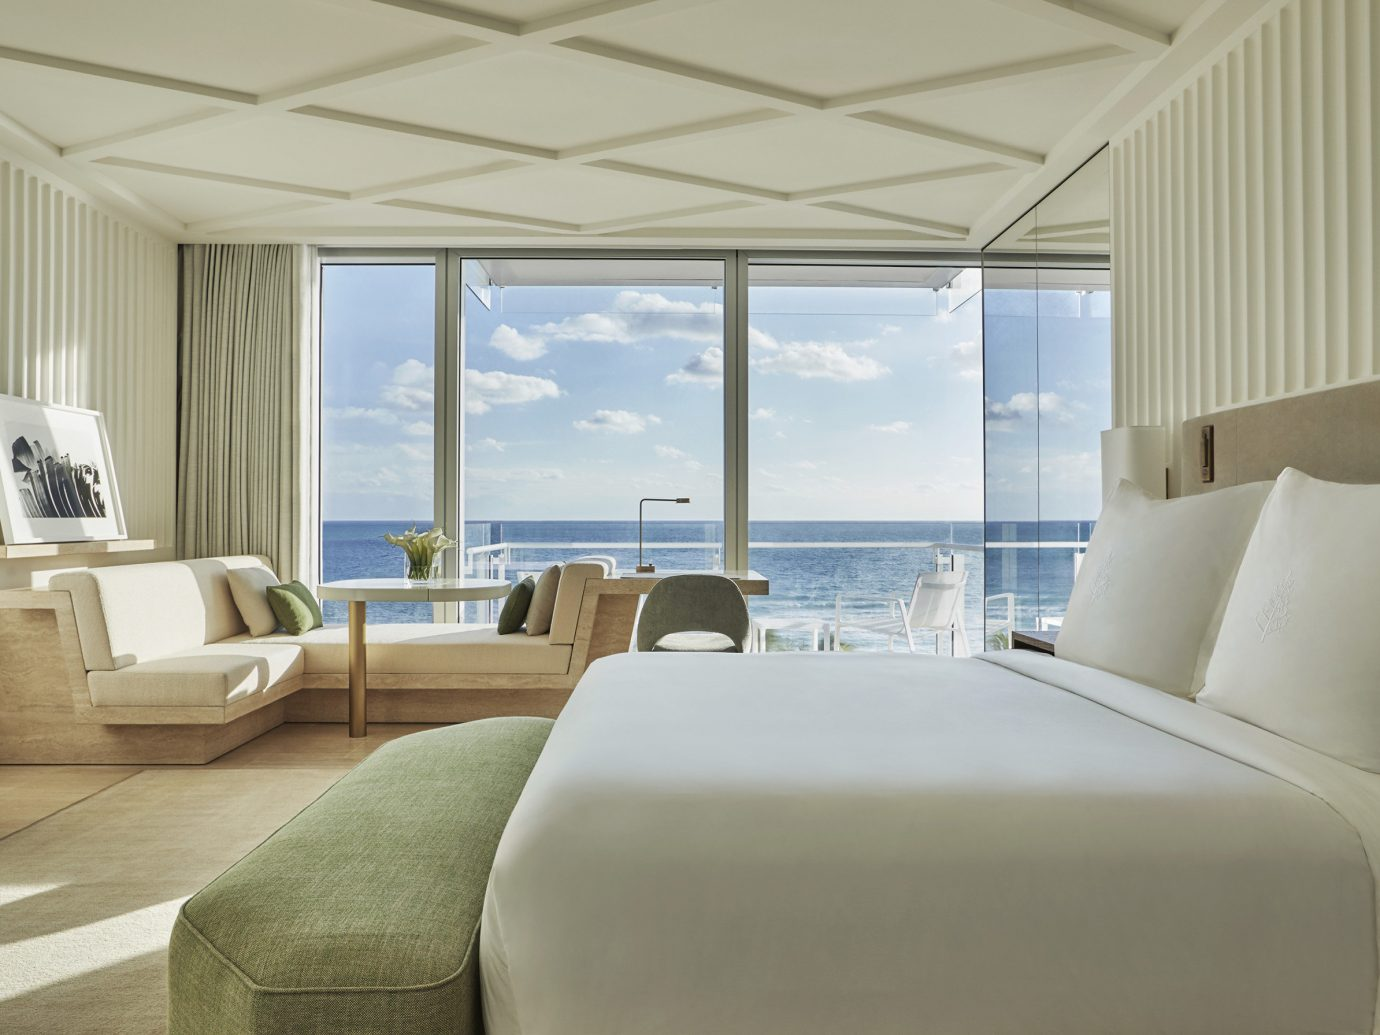 Four Seasons Hotel at The Surf Club - Miami Hotel